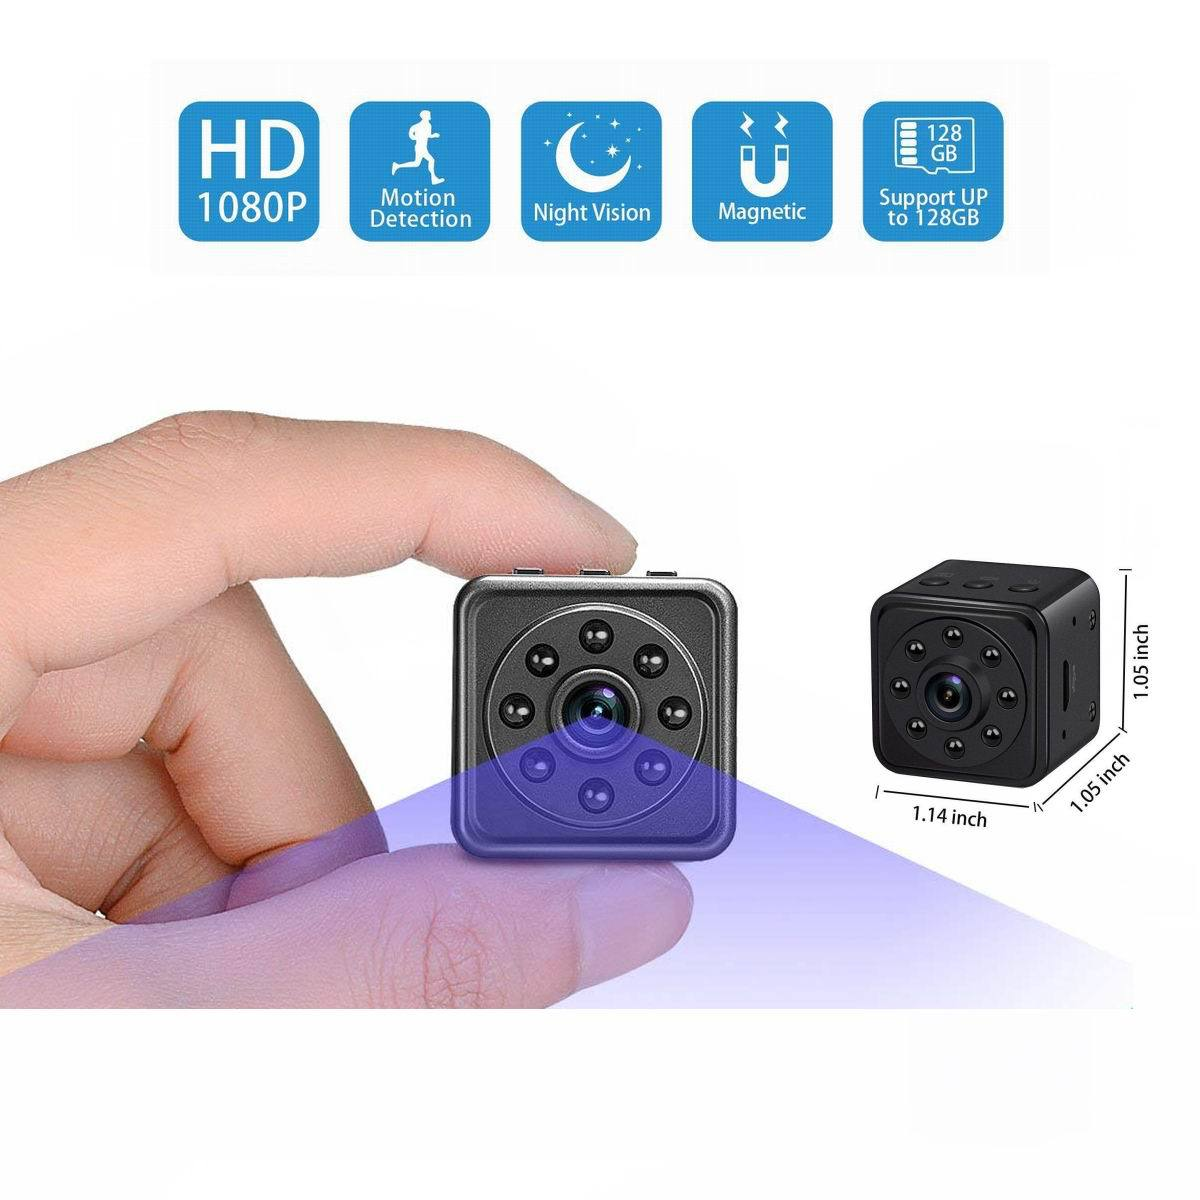 1080P High Definition Night Vision Small Cube Smart Camera black